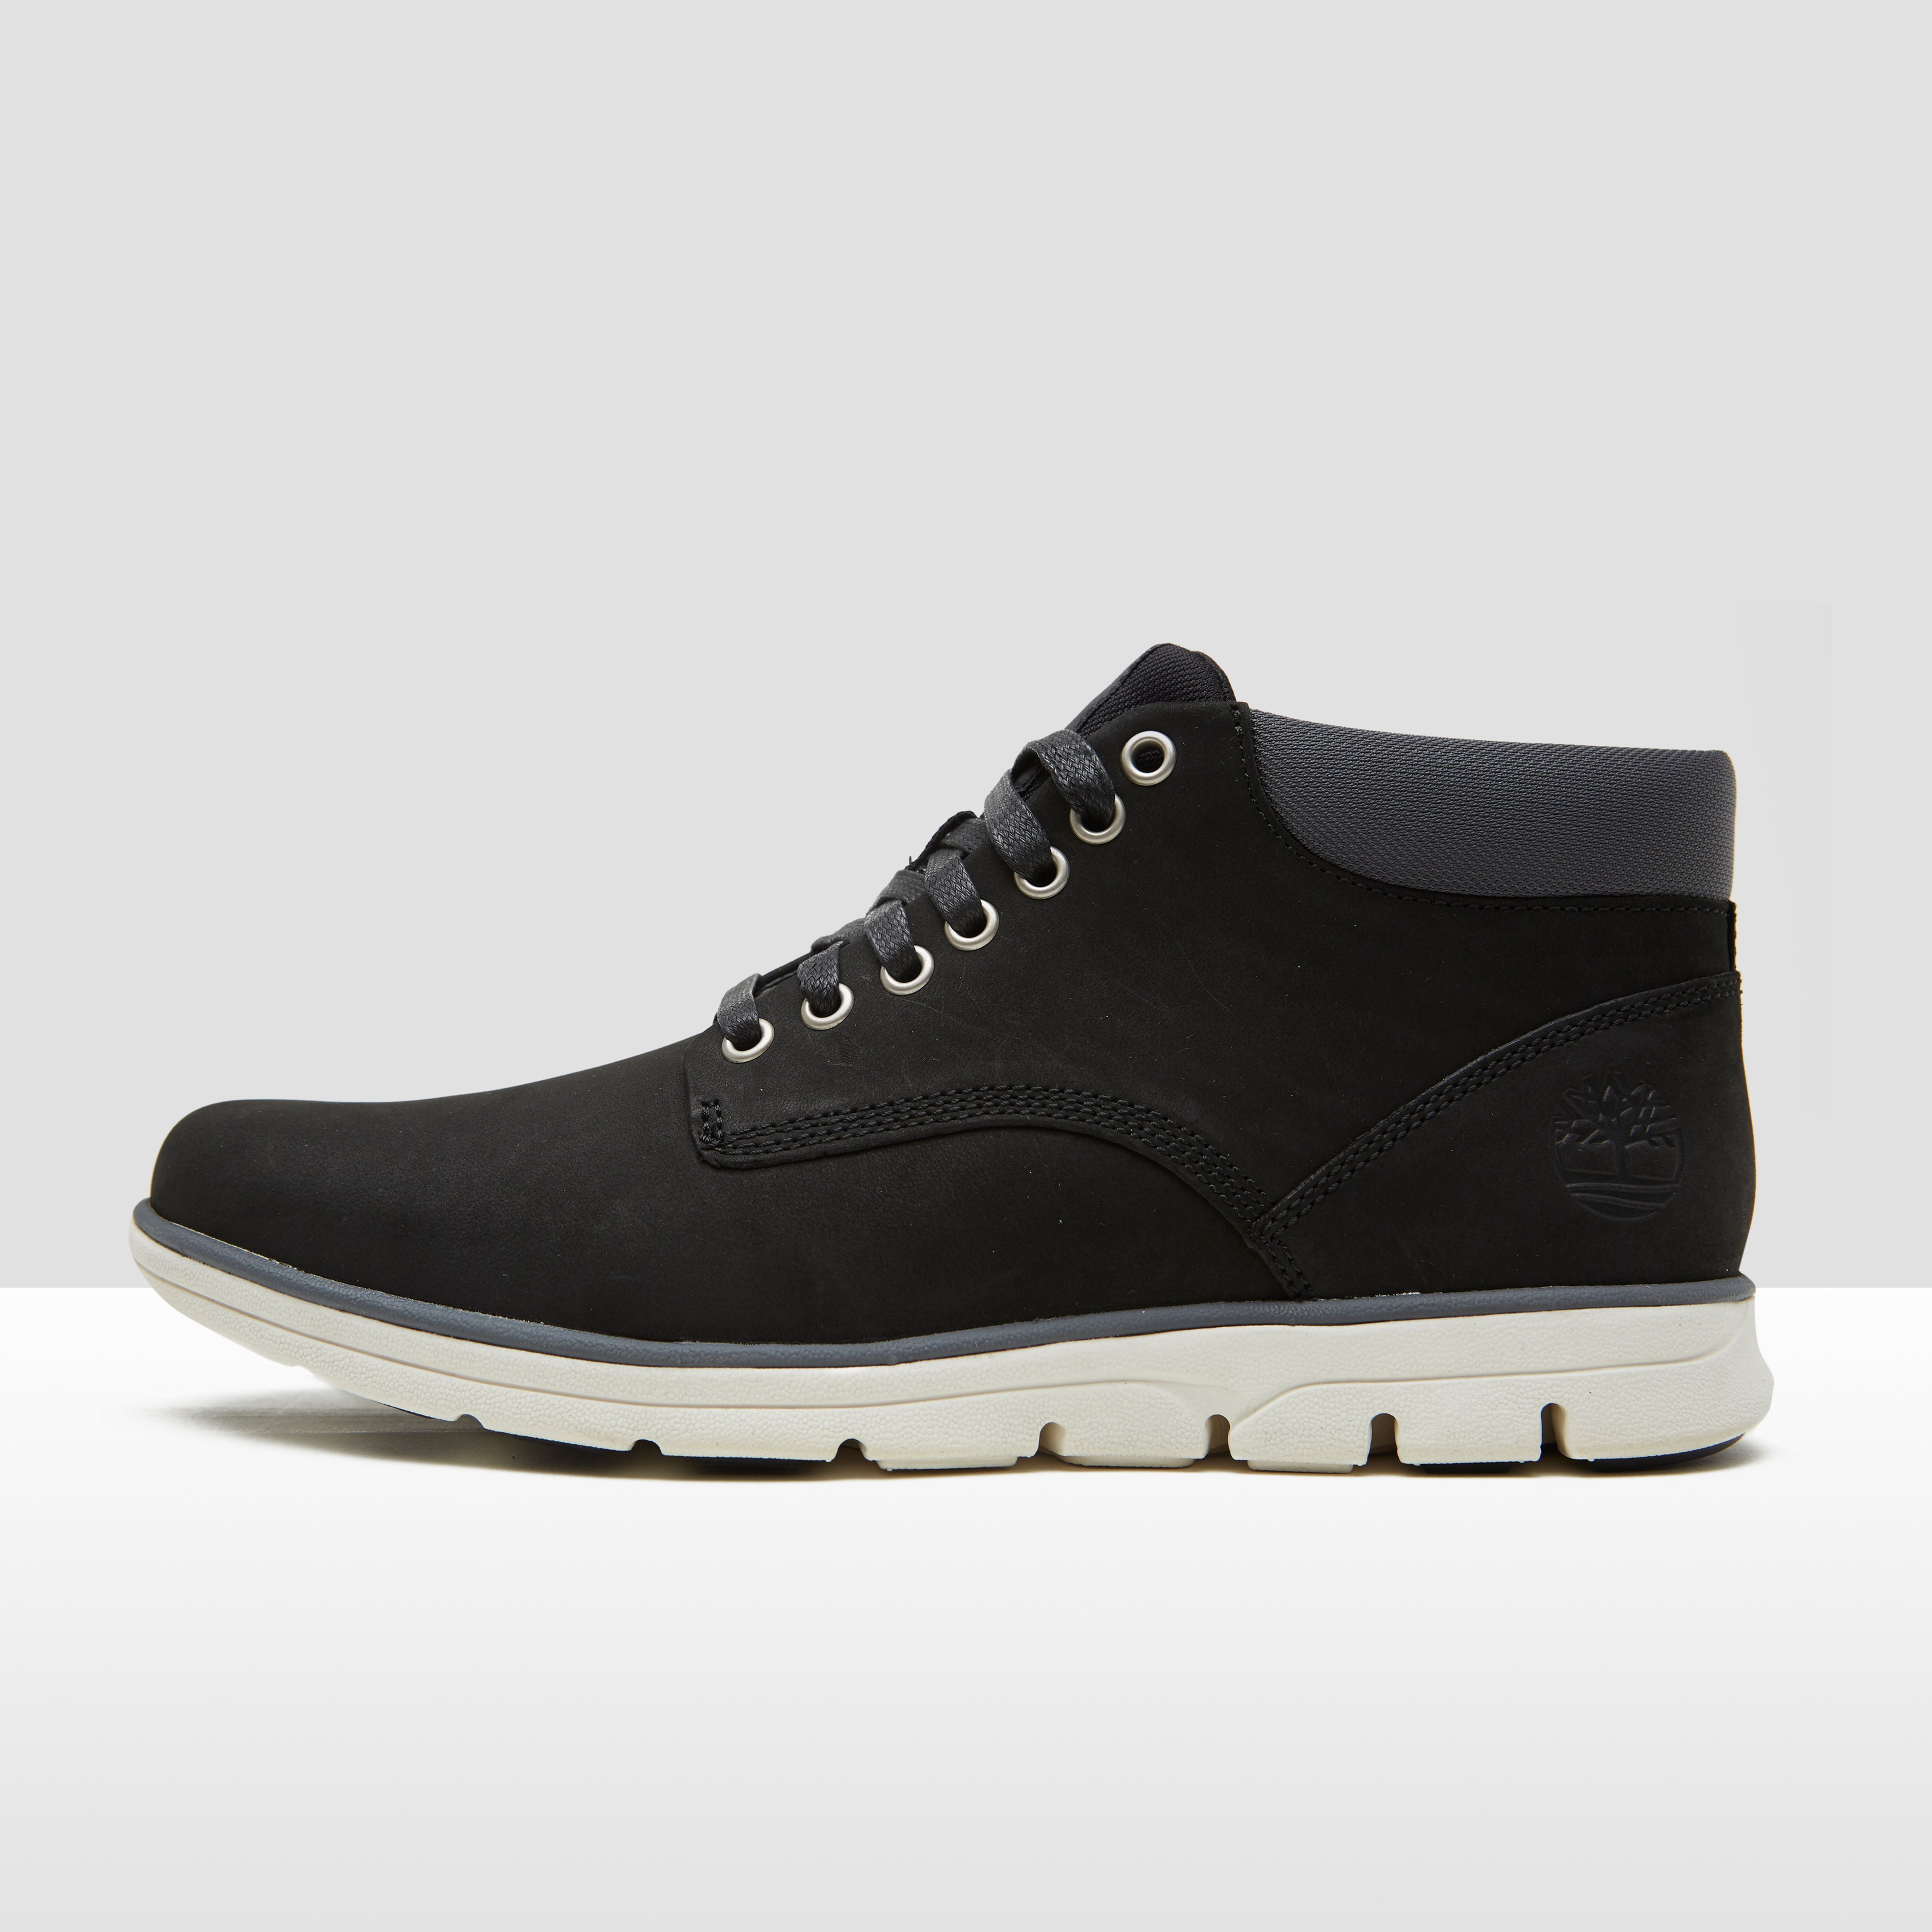 Hommes Timberland Sneakers Noir Bradstreet 6exeu3of